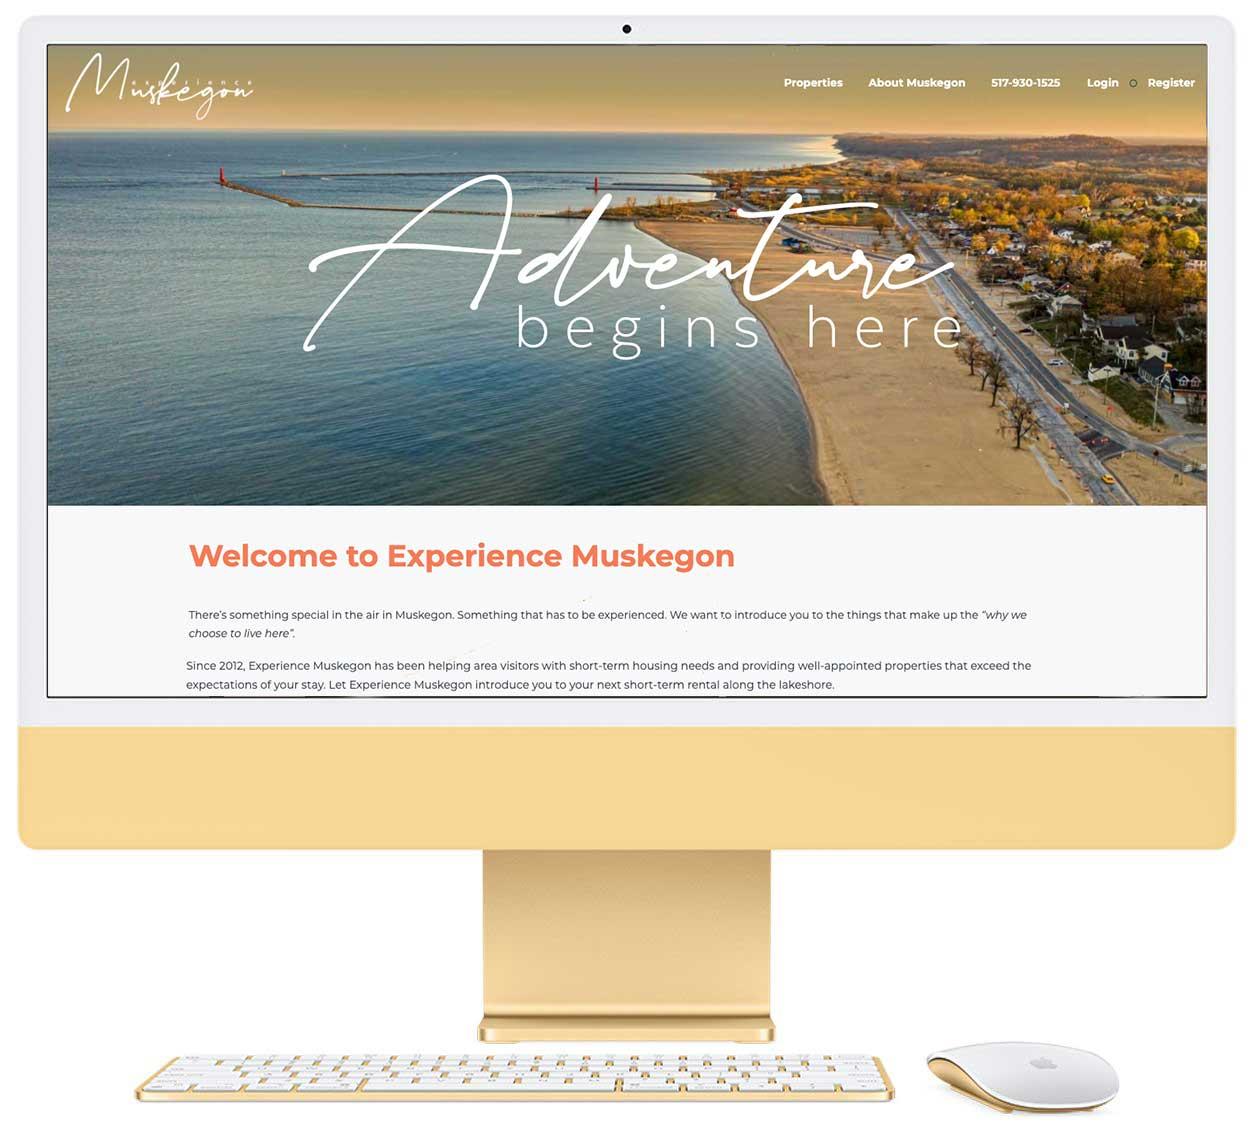 Experience Muskegon Vacation Rentals